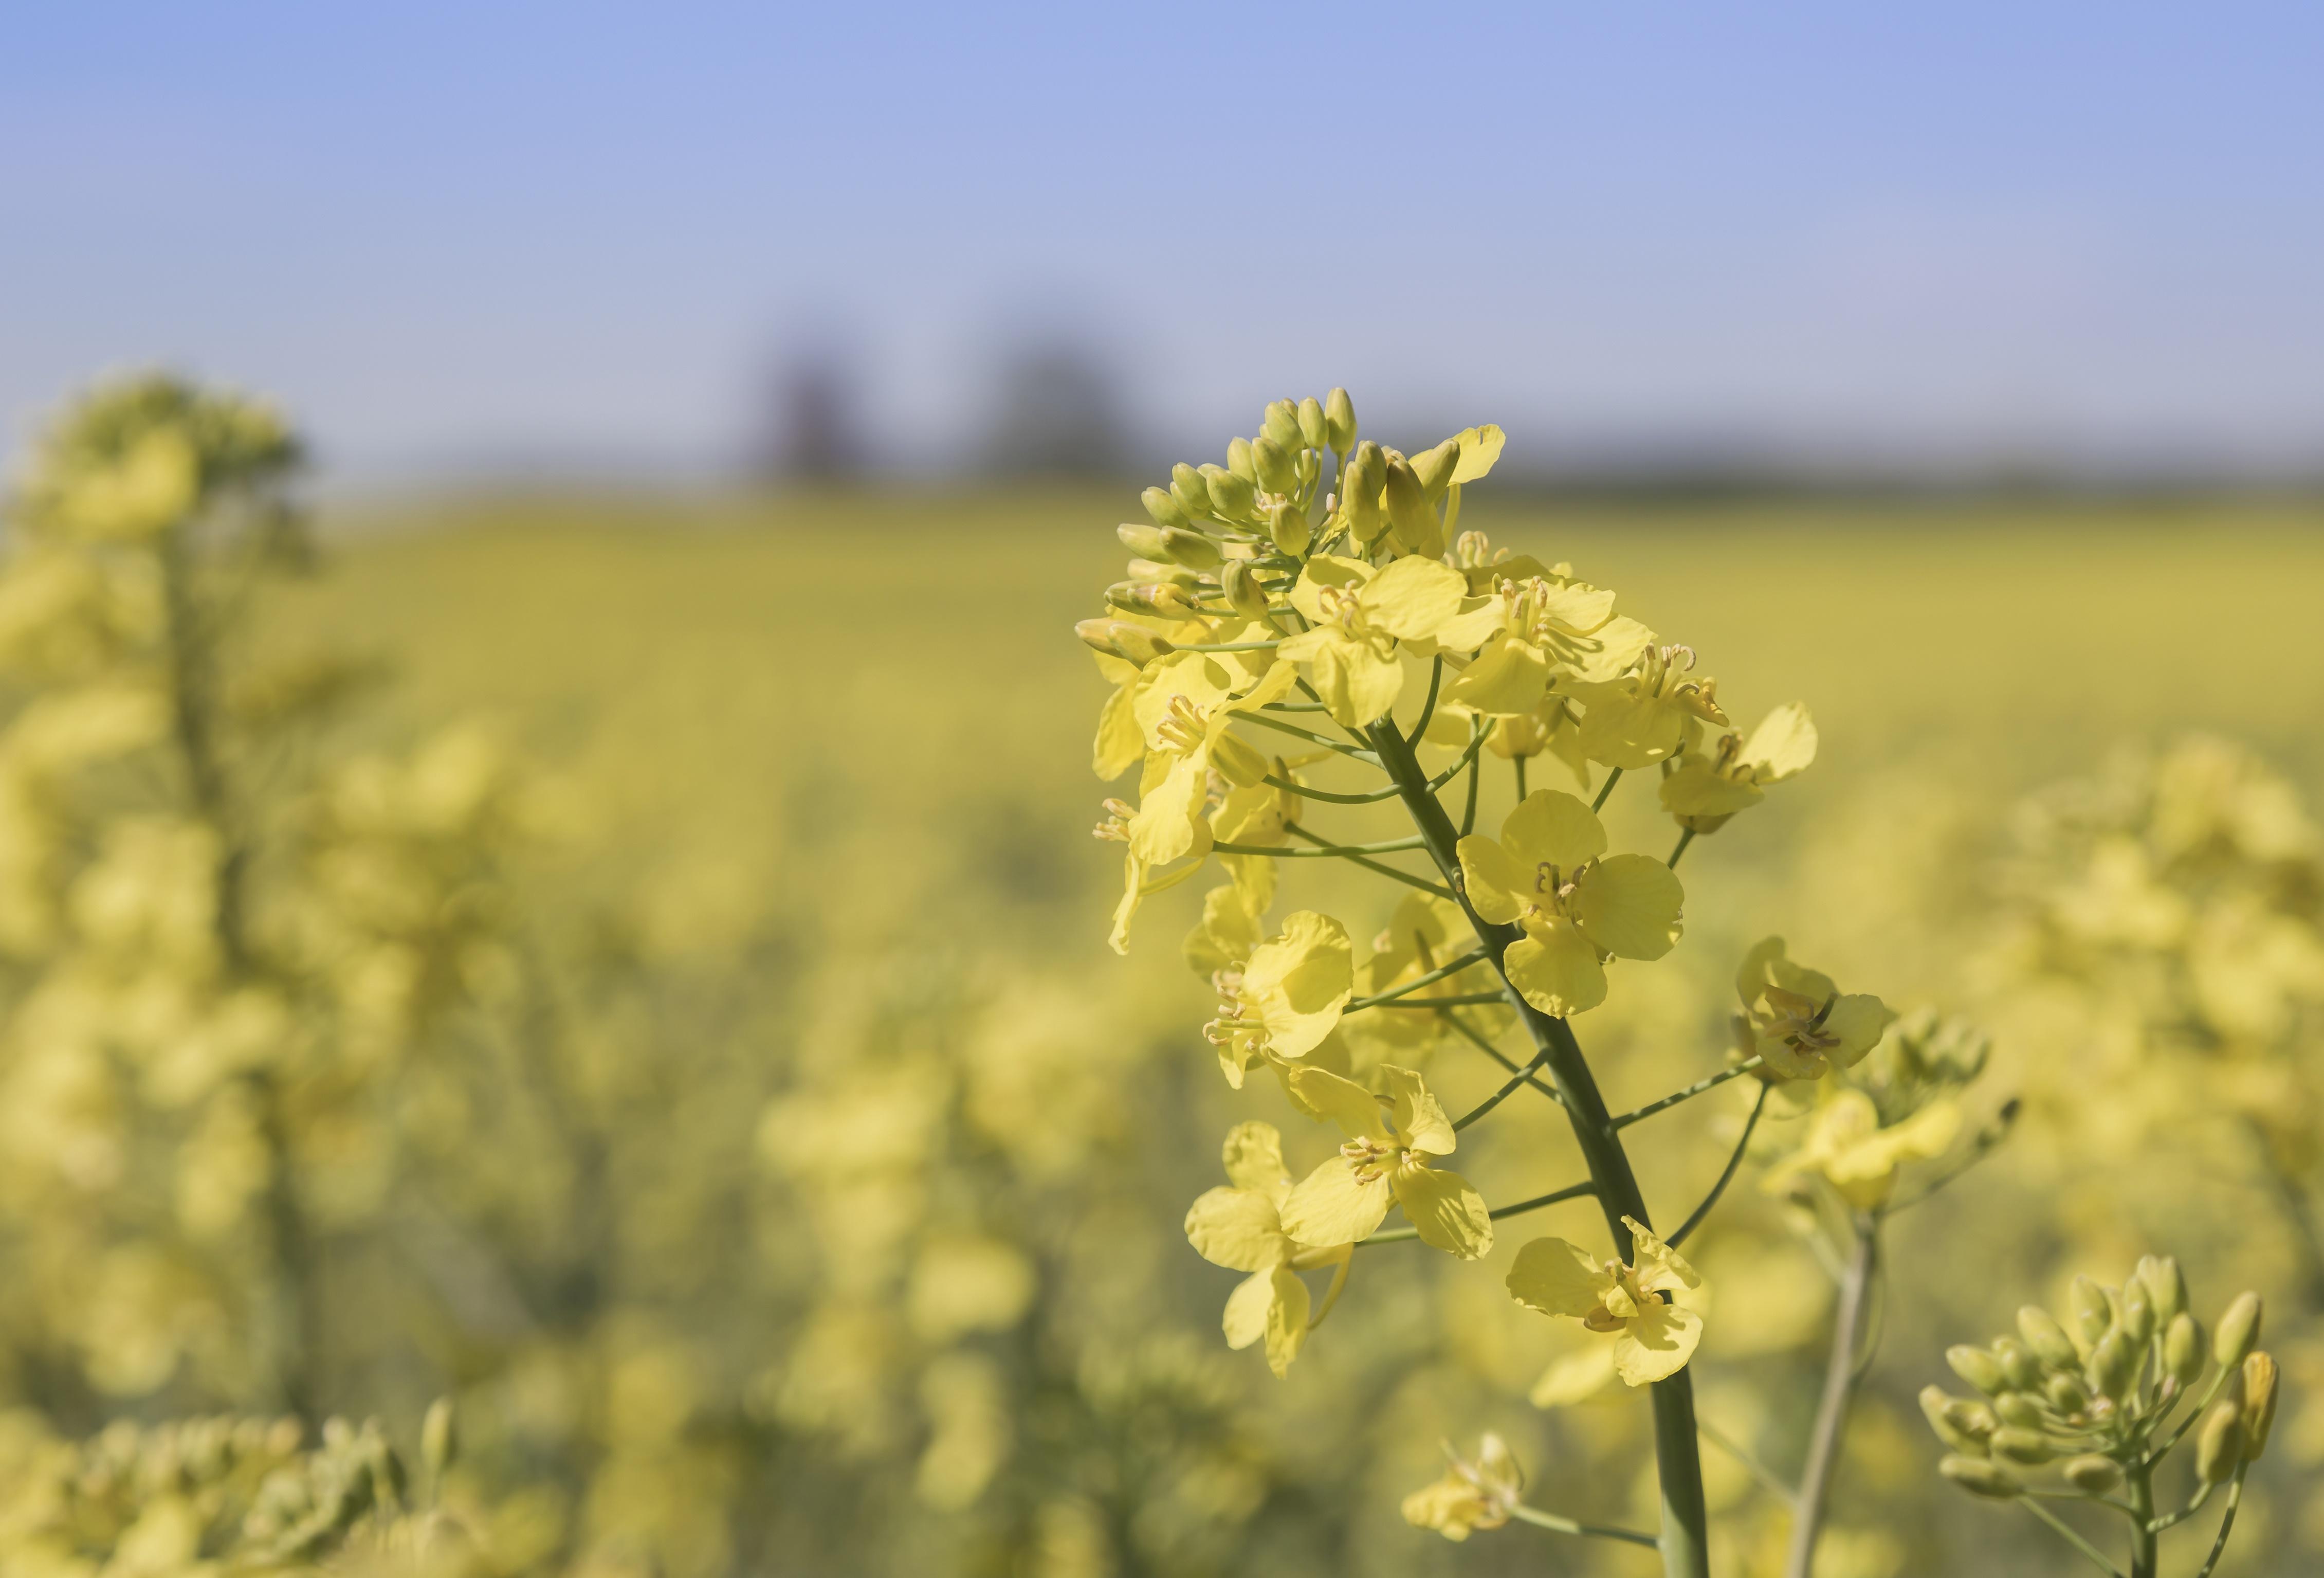 Canola is not sunflower or safflower oil